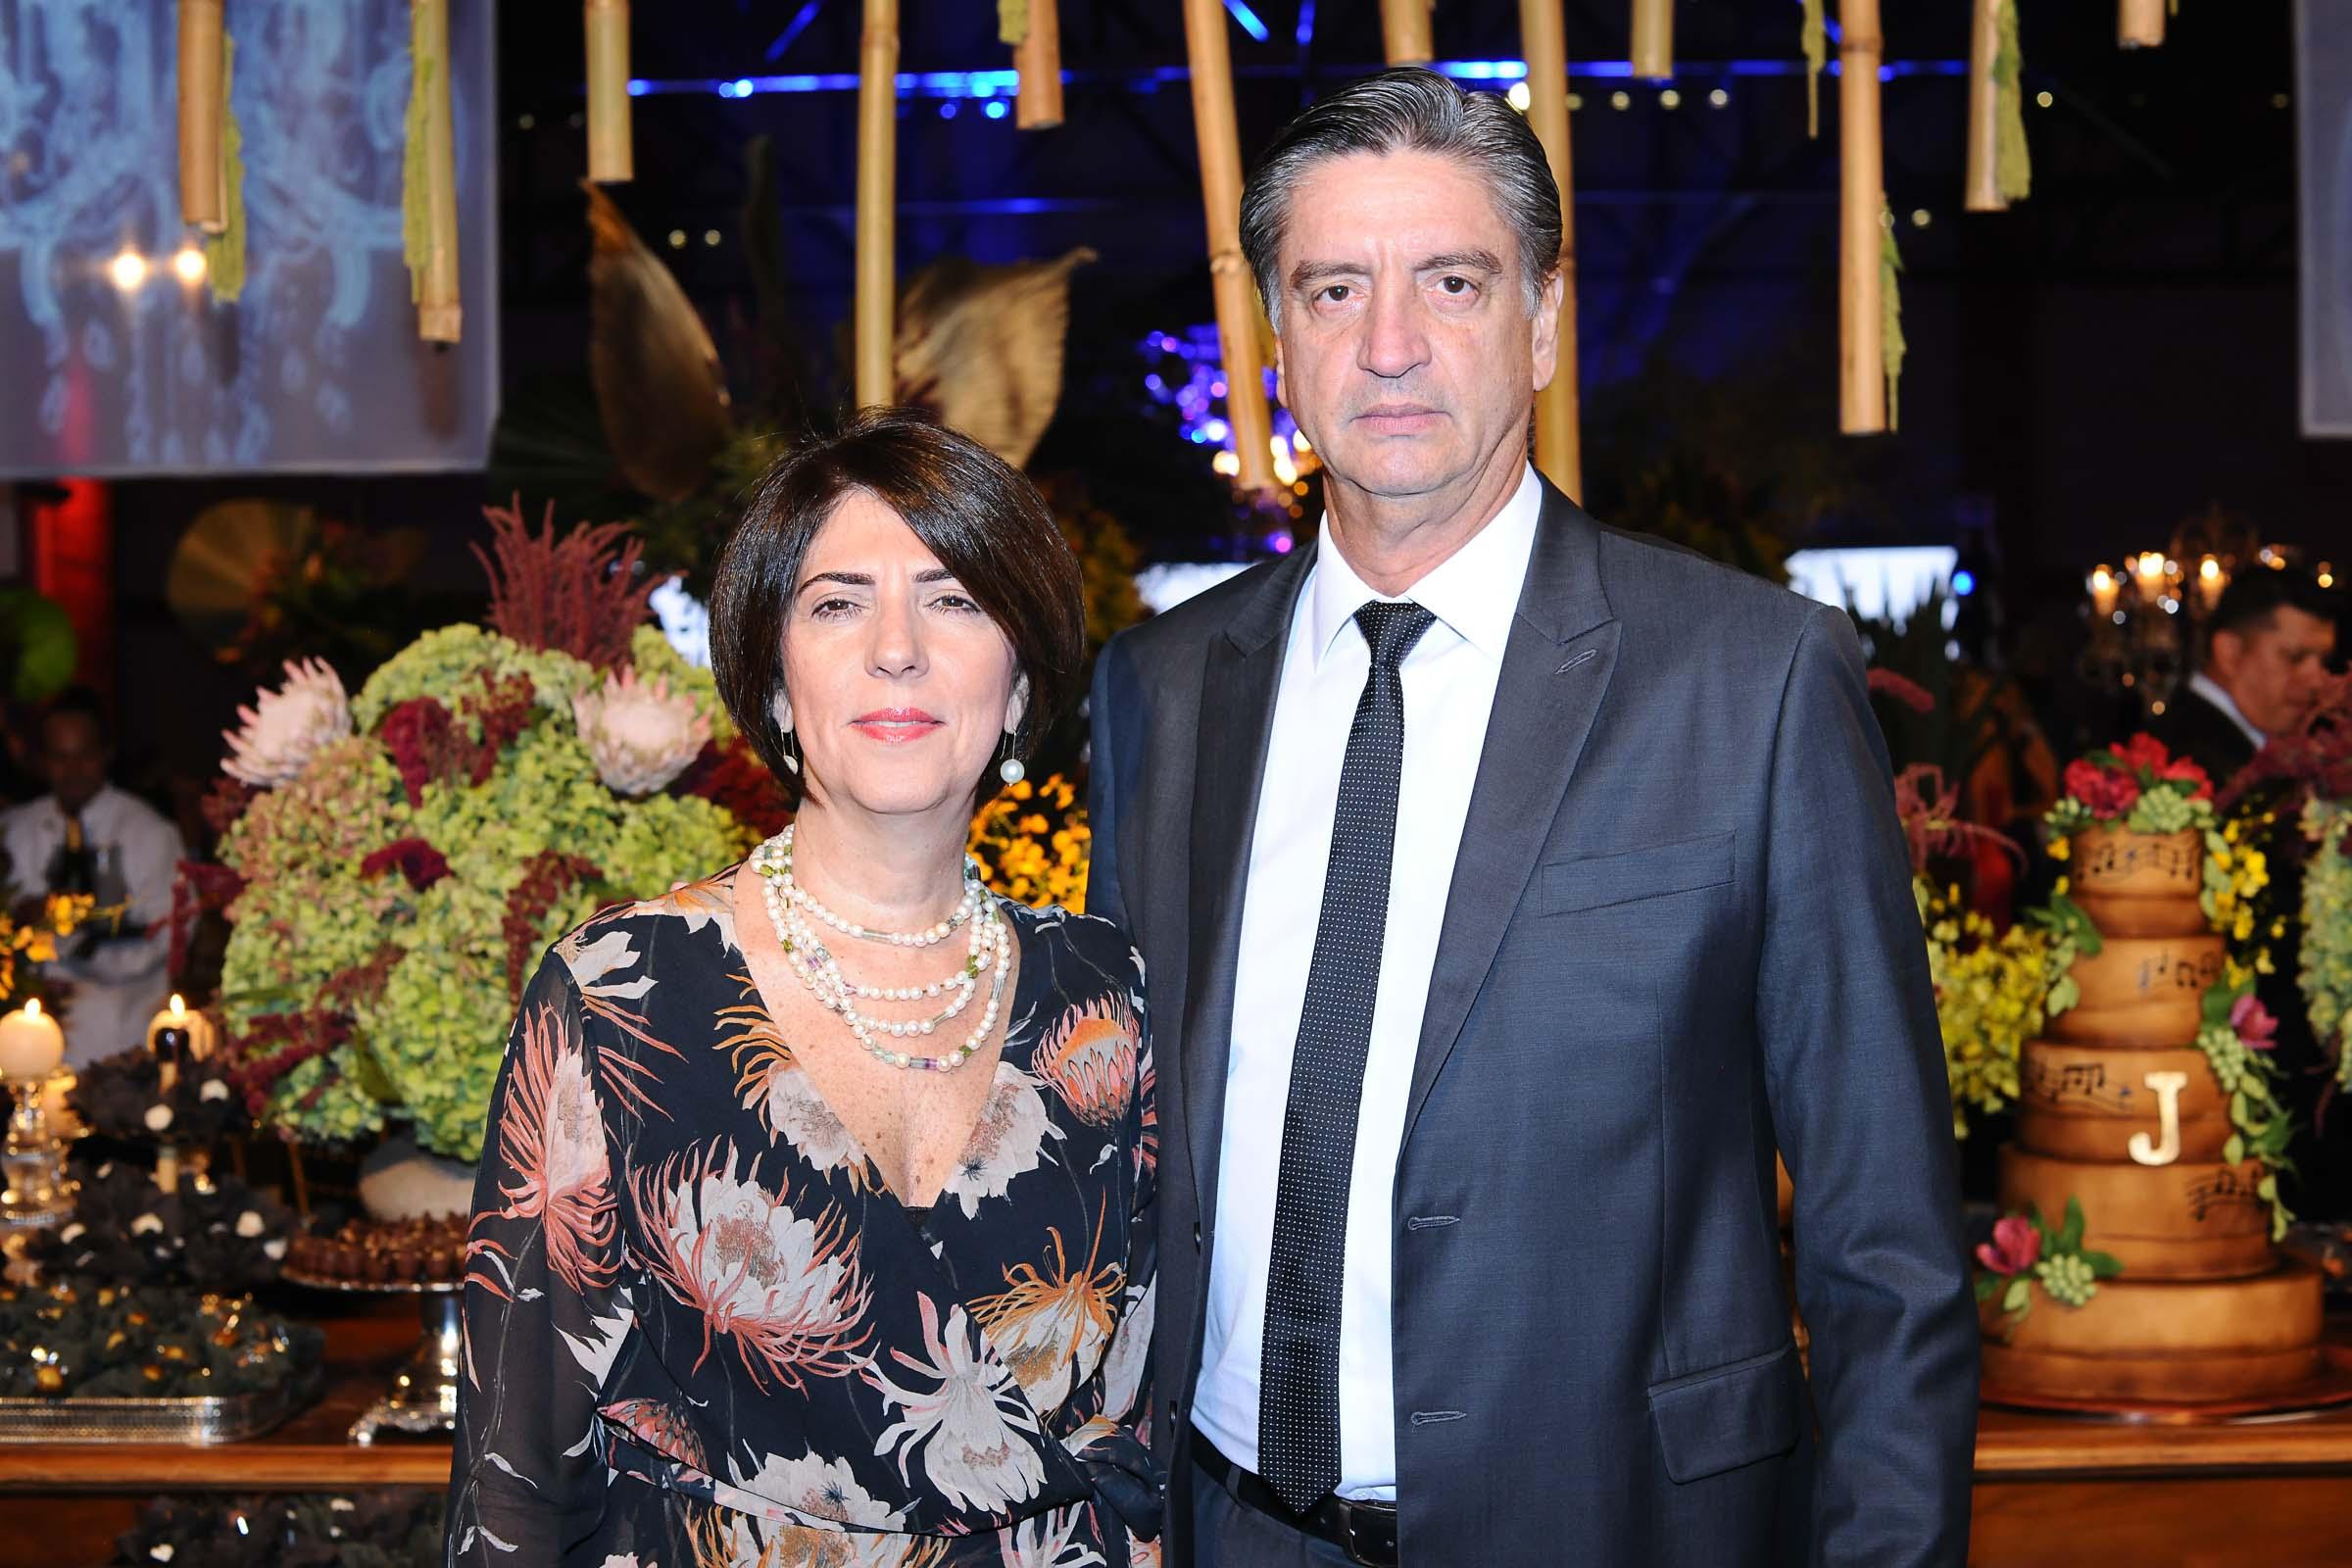 Maria Verônica Safadi e o deputado federal, Dagoberto Nogueira